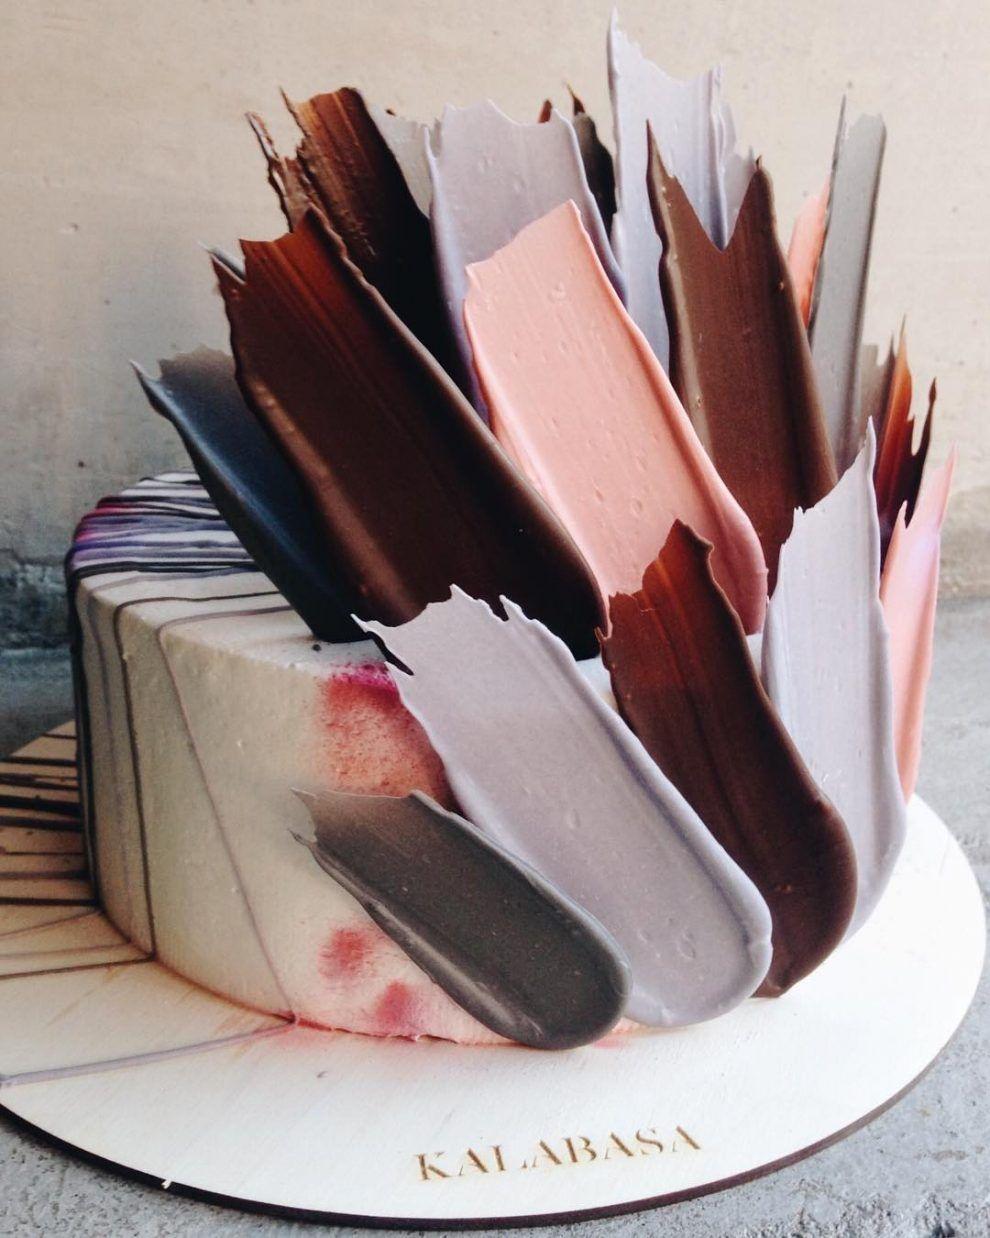 Innovative Russian Bakery Uses 'Brushstroke' Decorations To Create The Most Amazing Cakes #amazingcakes